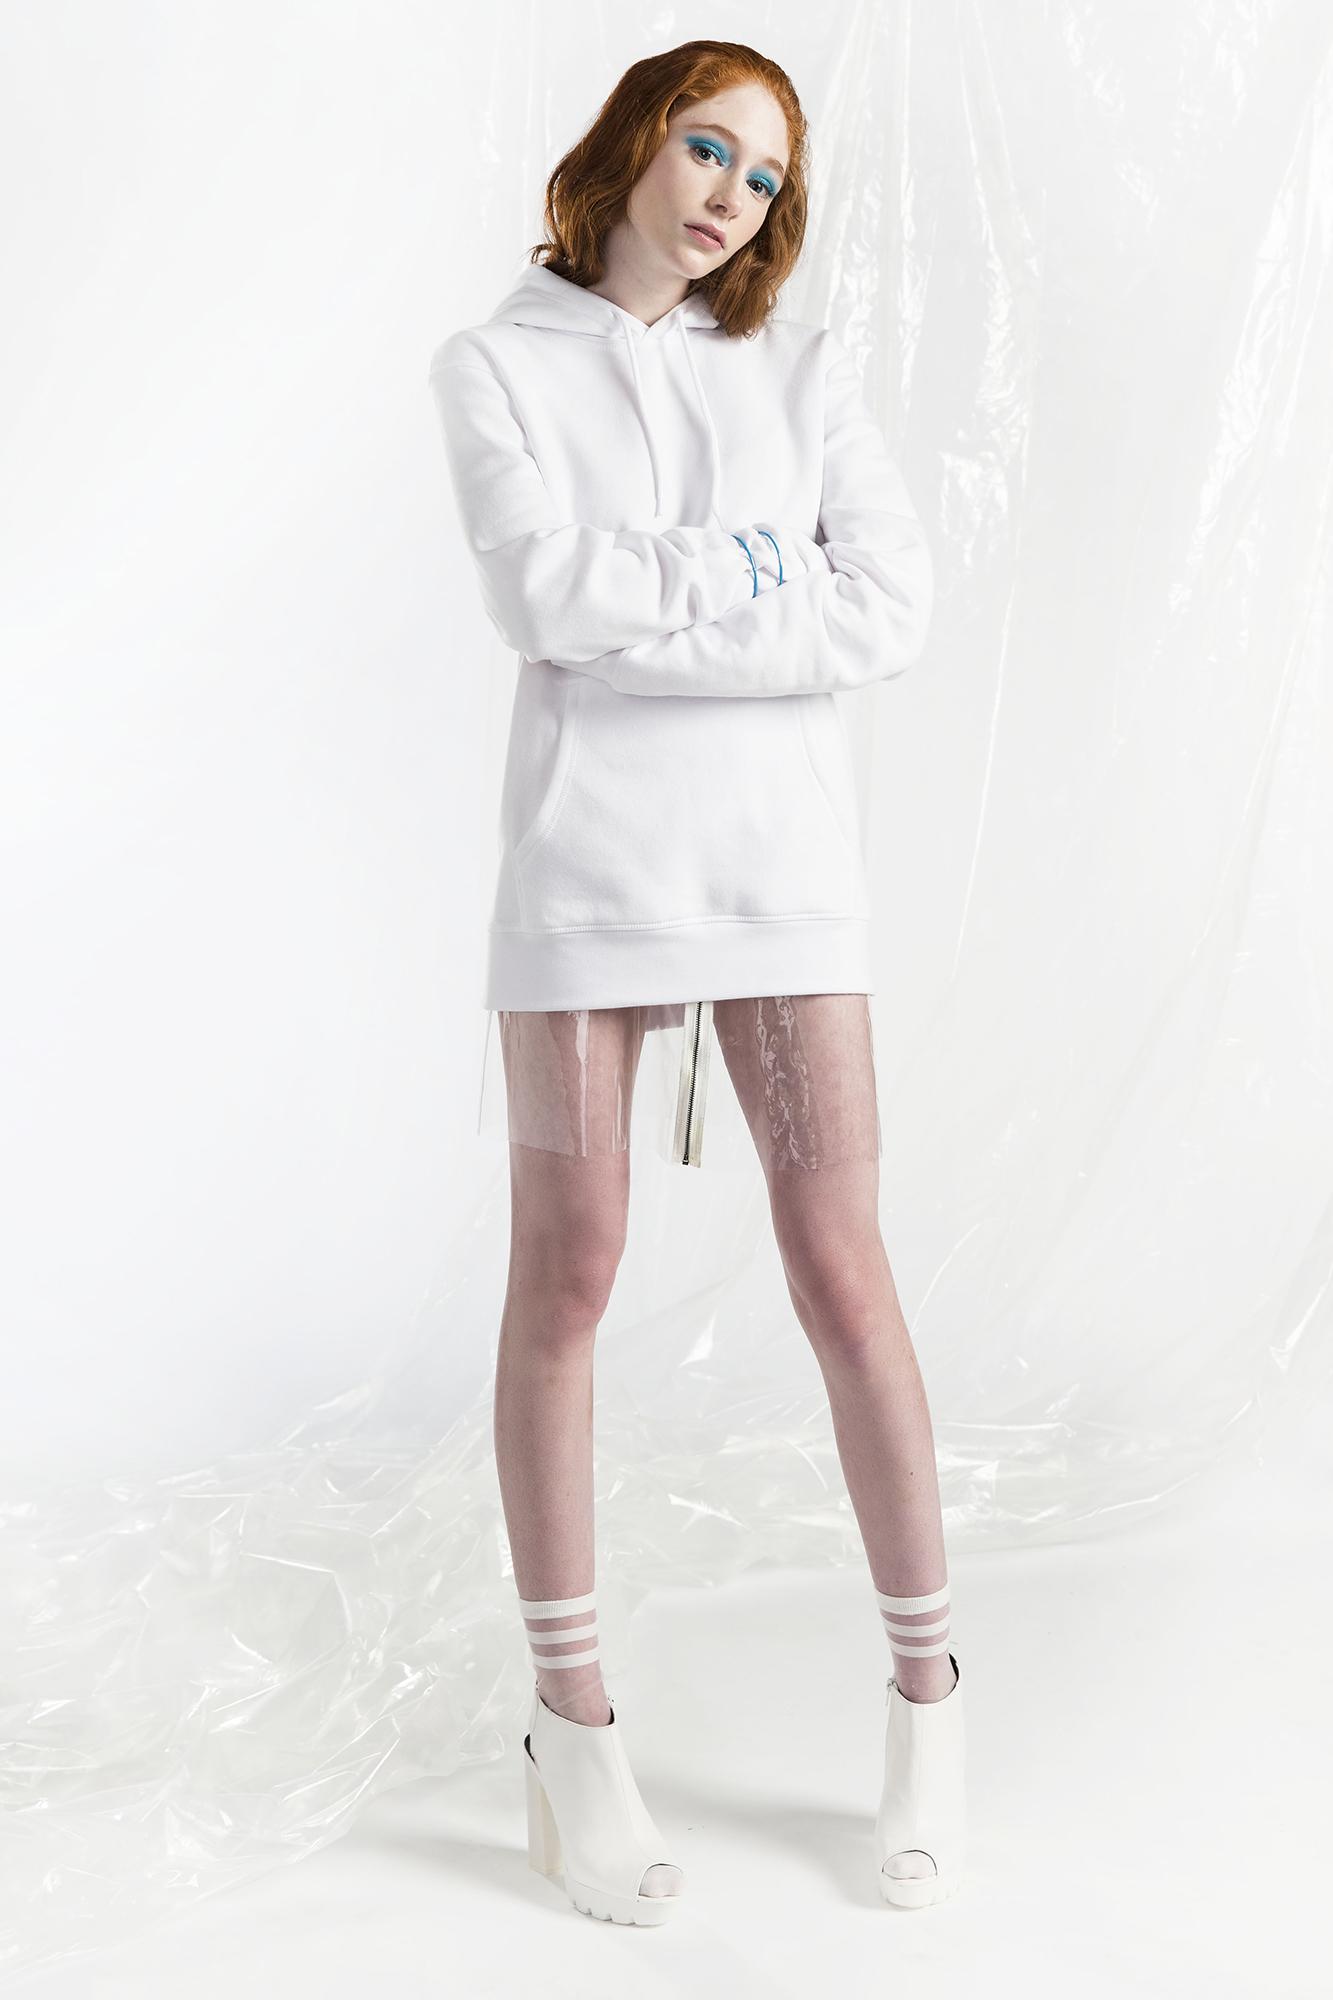 Studio Fashion Editorial Photography